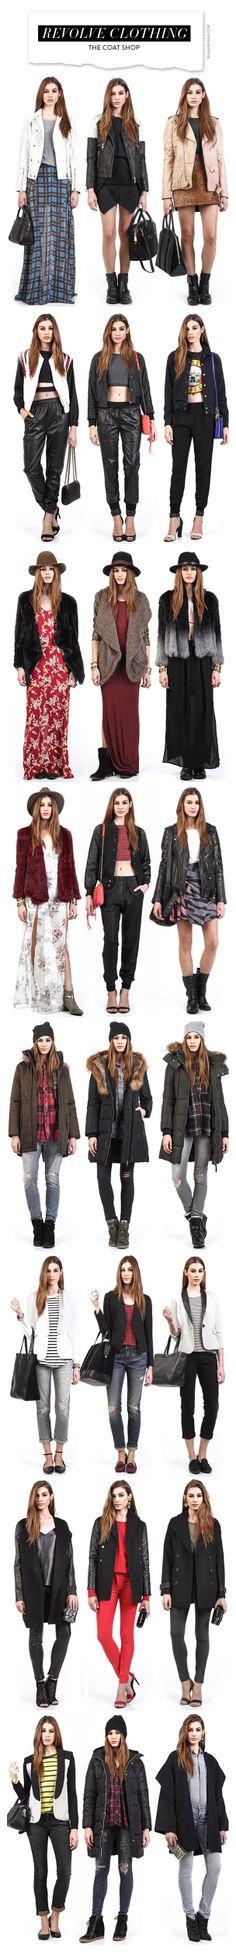 Revolve Clothing – The Coat Shop